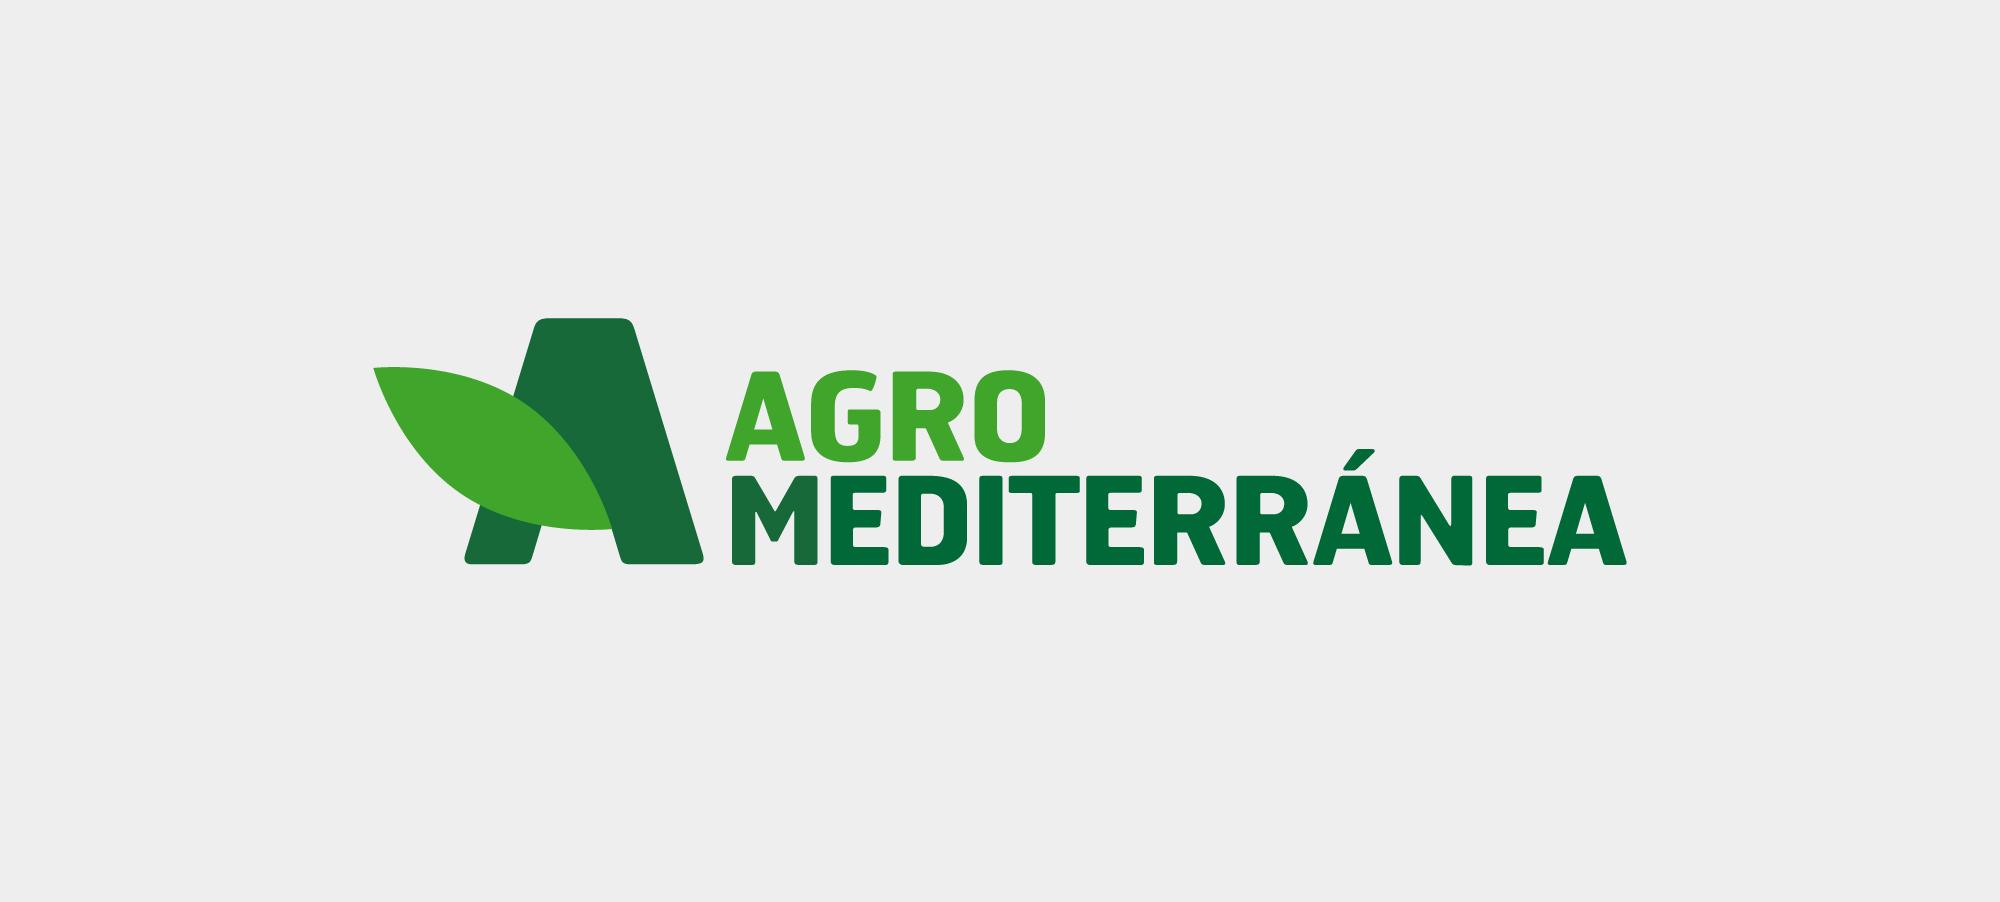 Agromediterranea-branding-001